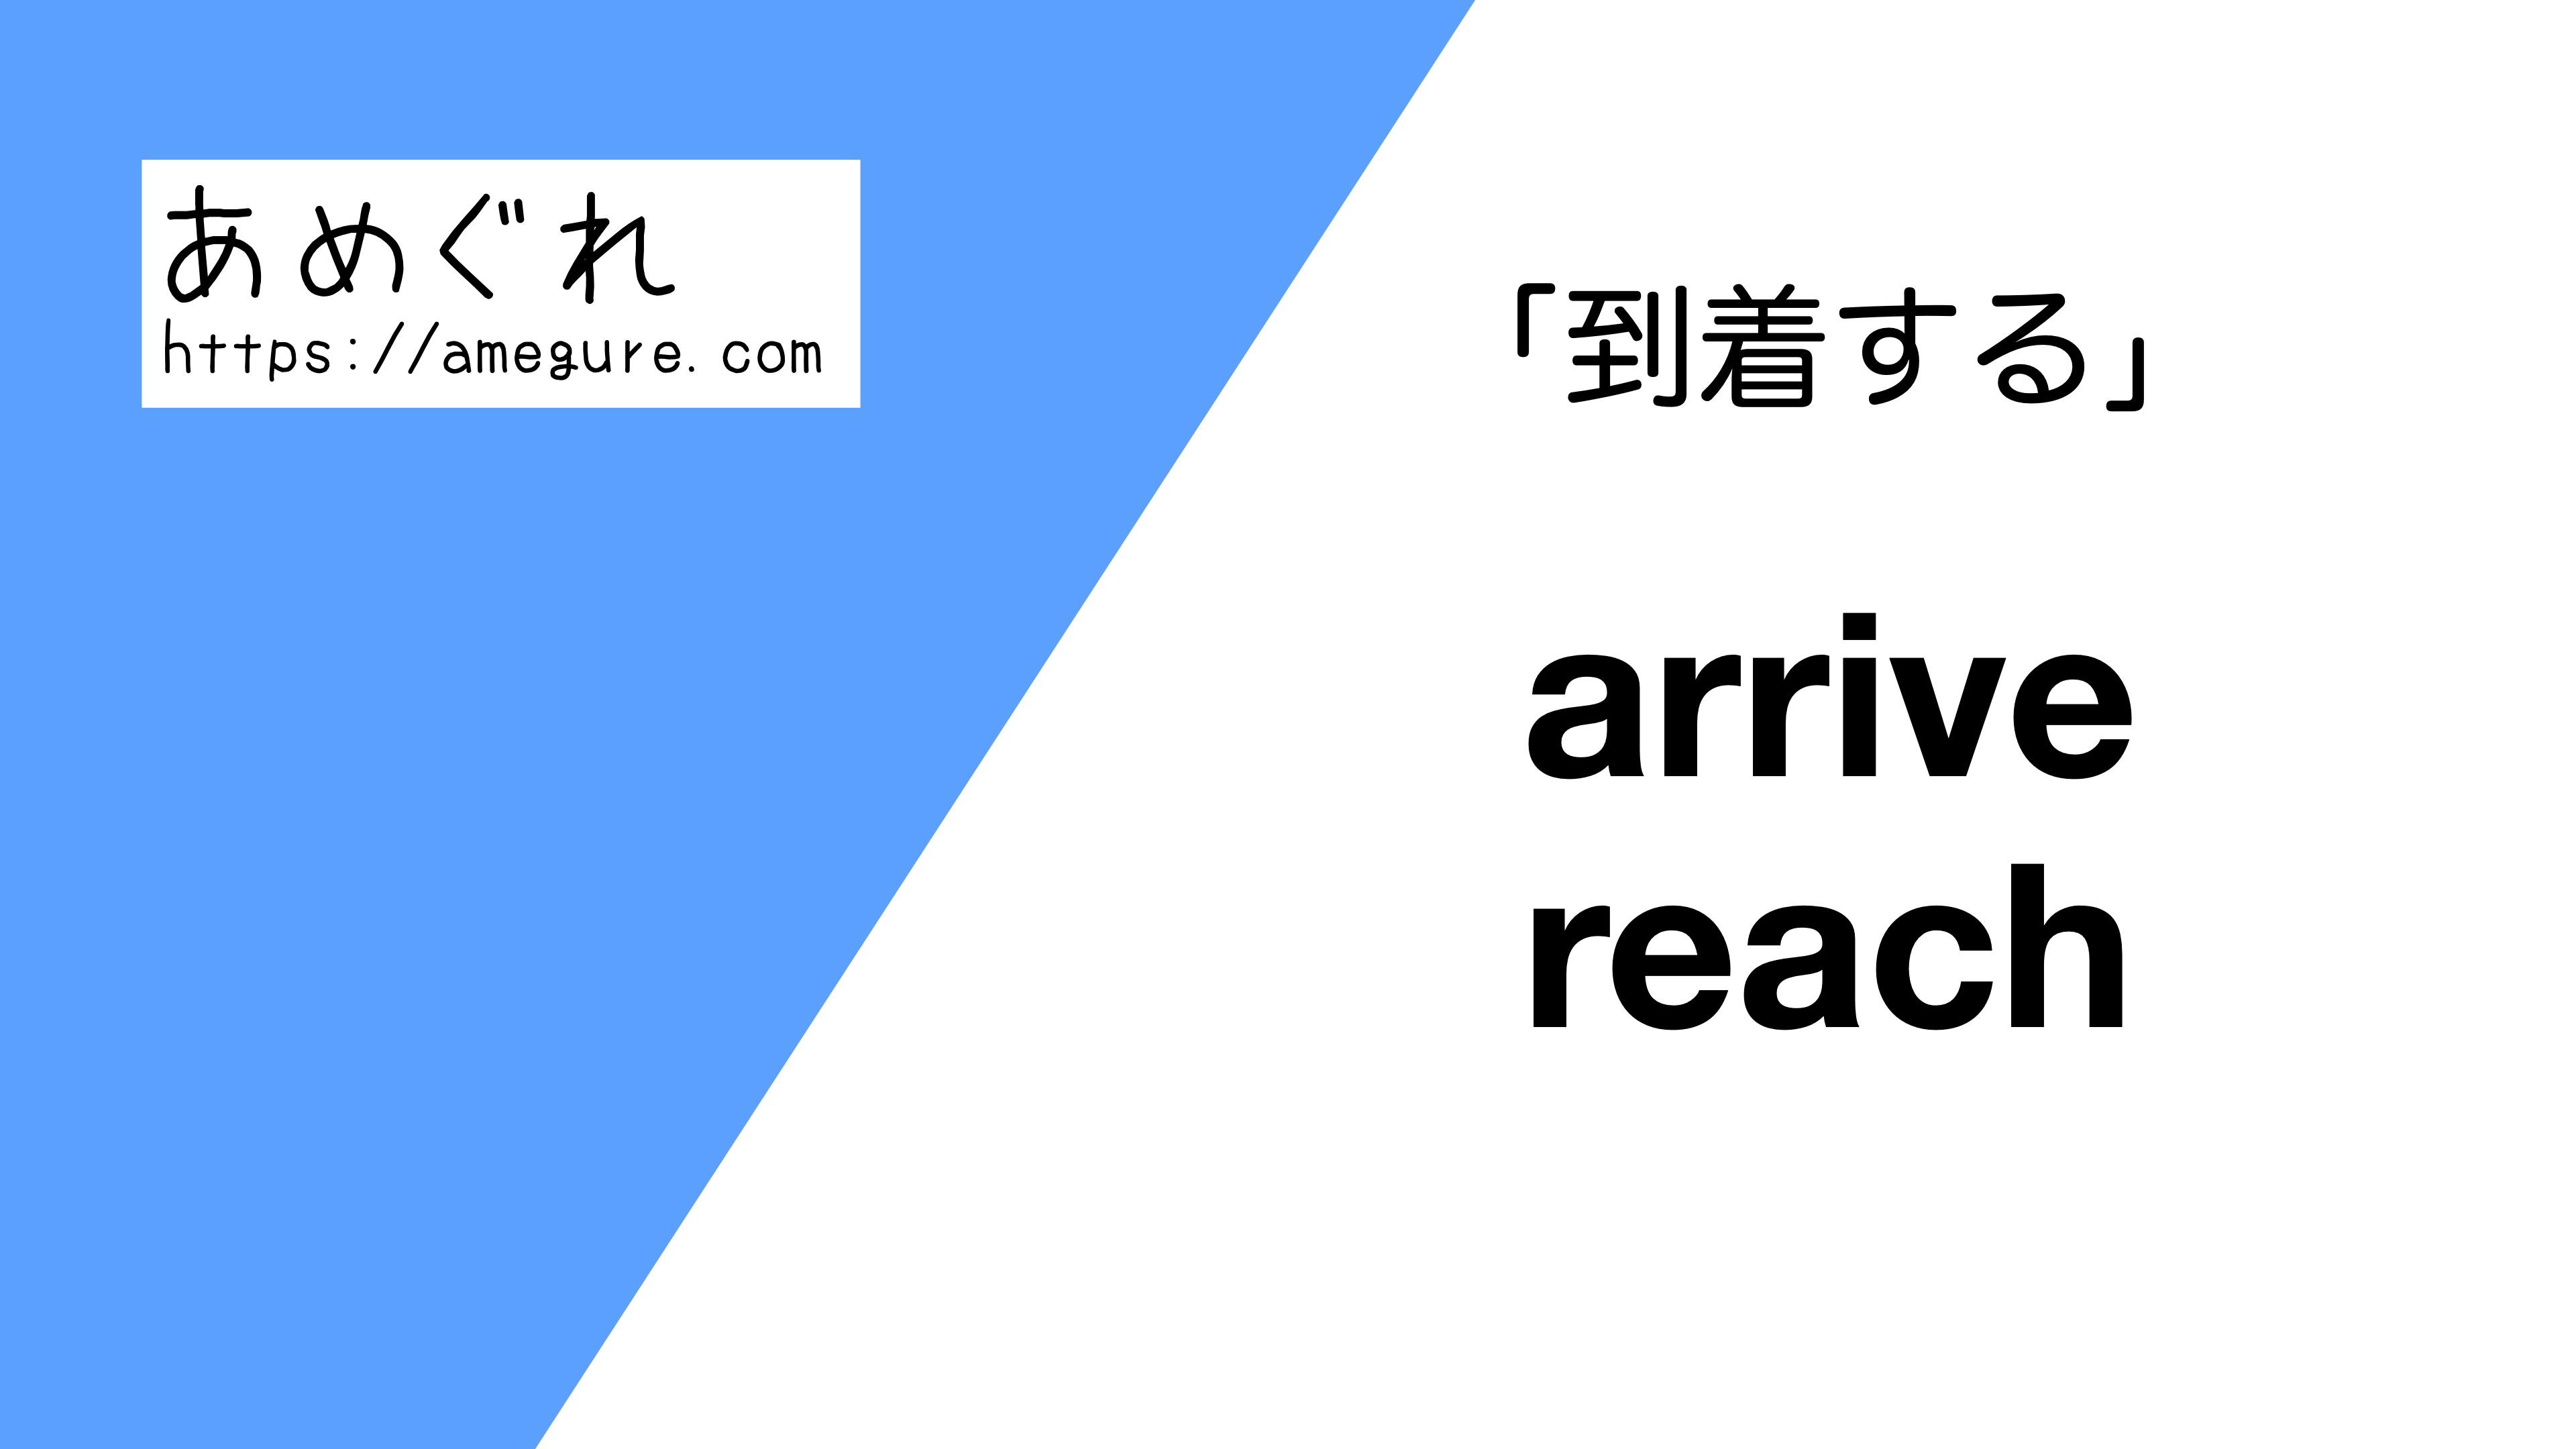 arrive-reach違い